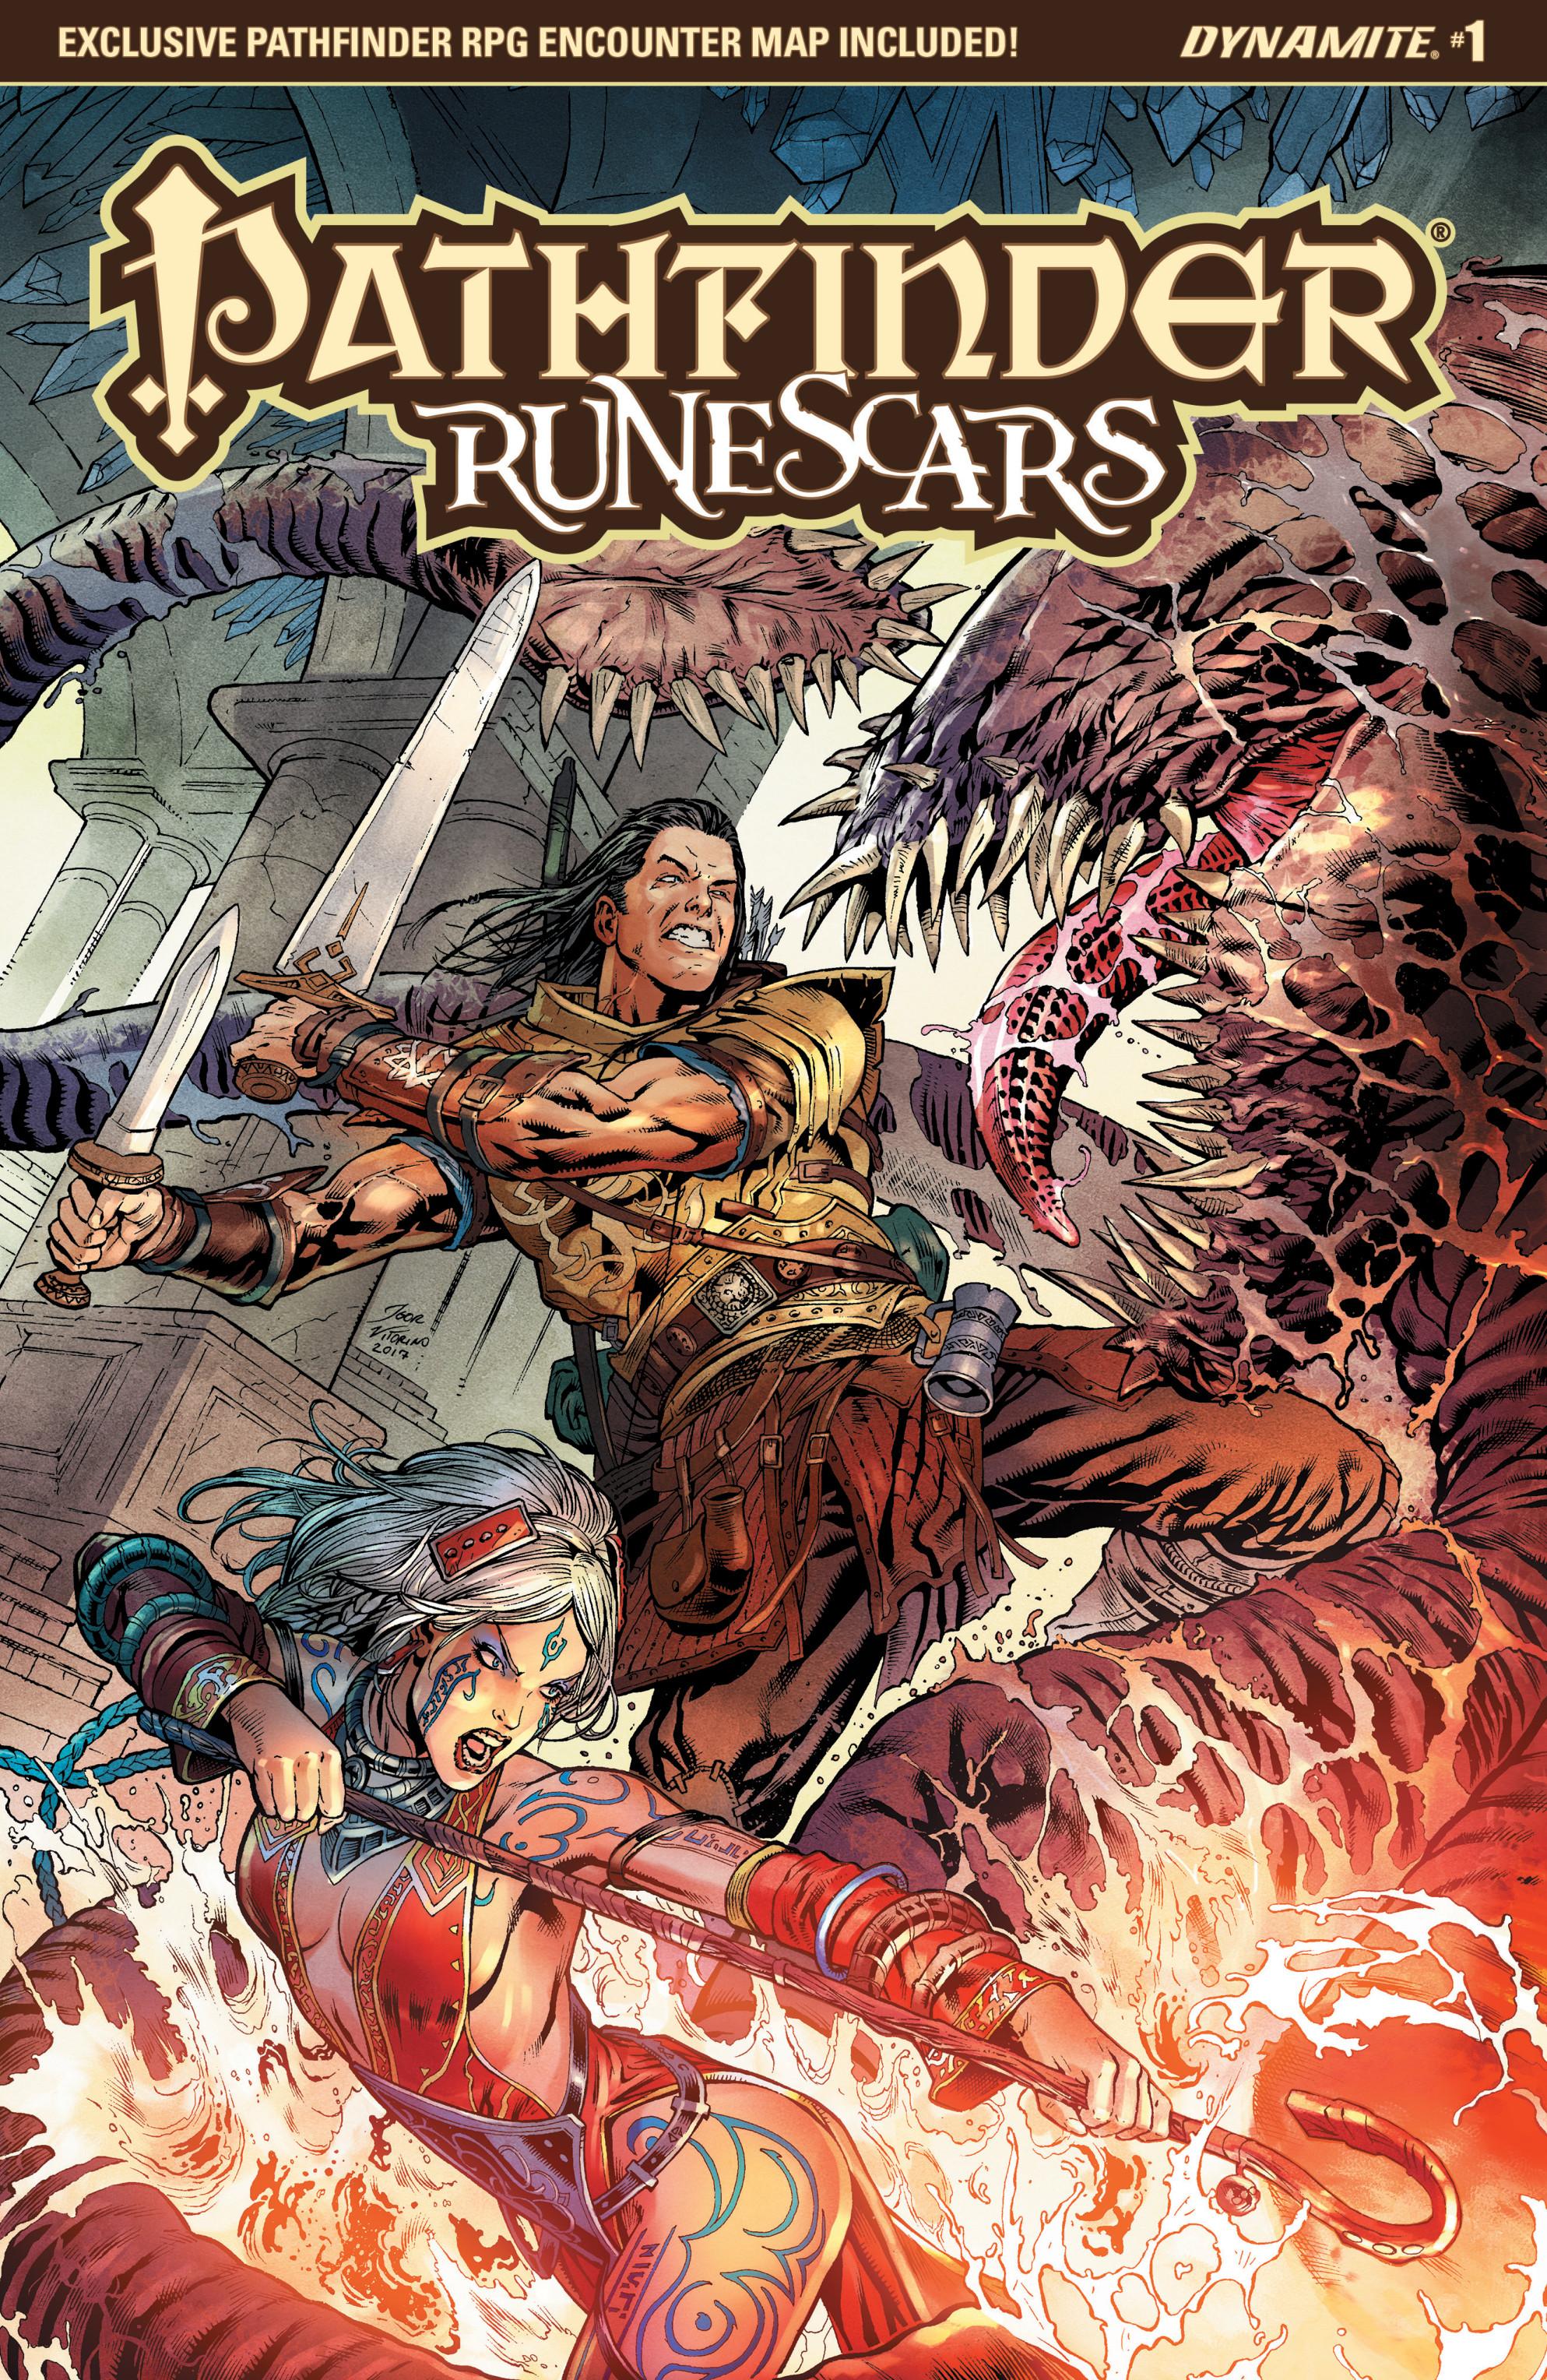 Read online Pathfinder: Runescars comic -  Issue #1 - 3